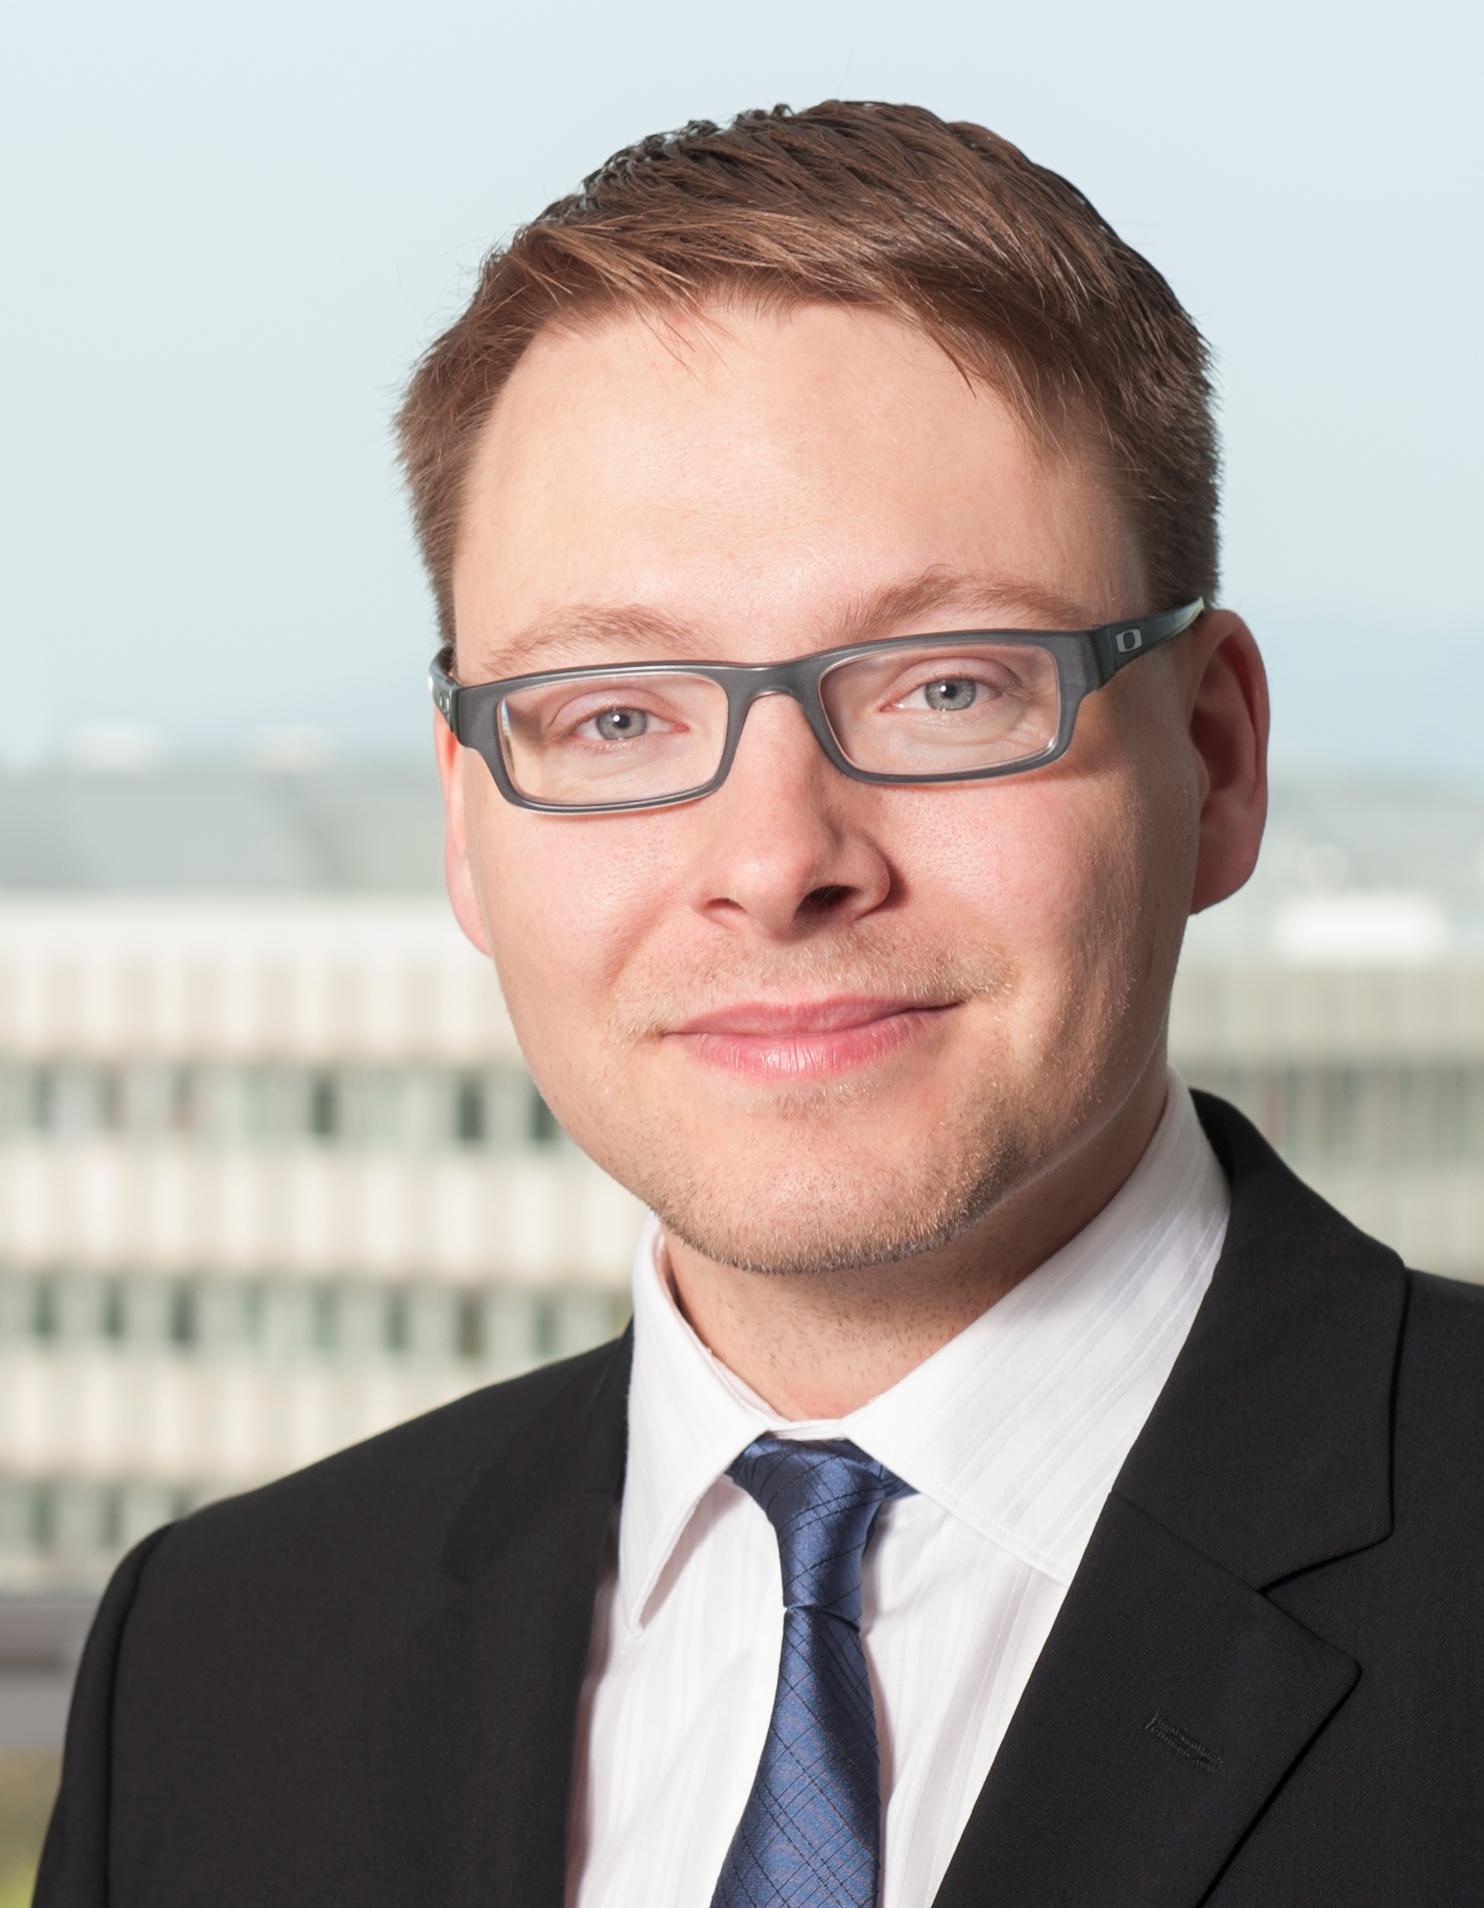 Ralf-Roman Schmidt Profilbild